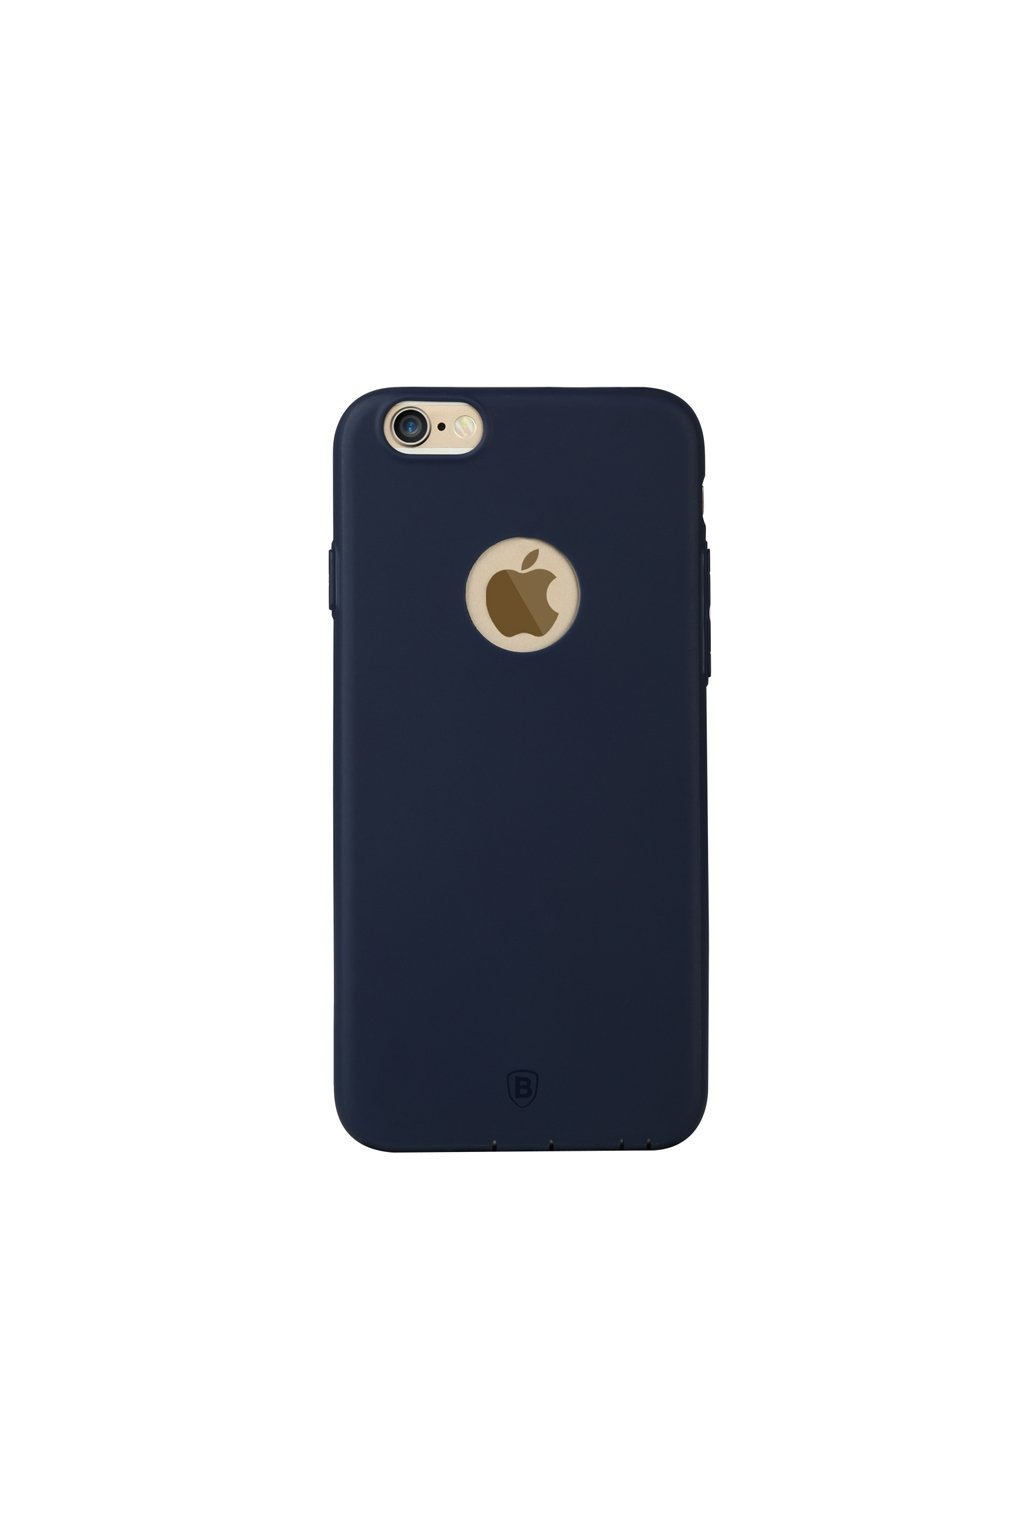 Pouzdro Apple iPhone 6/6S Plus Baseus TPU Mousse, dark blue